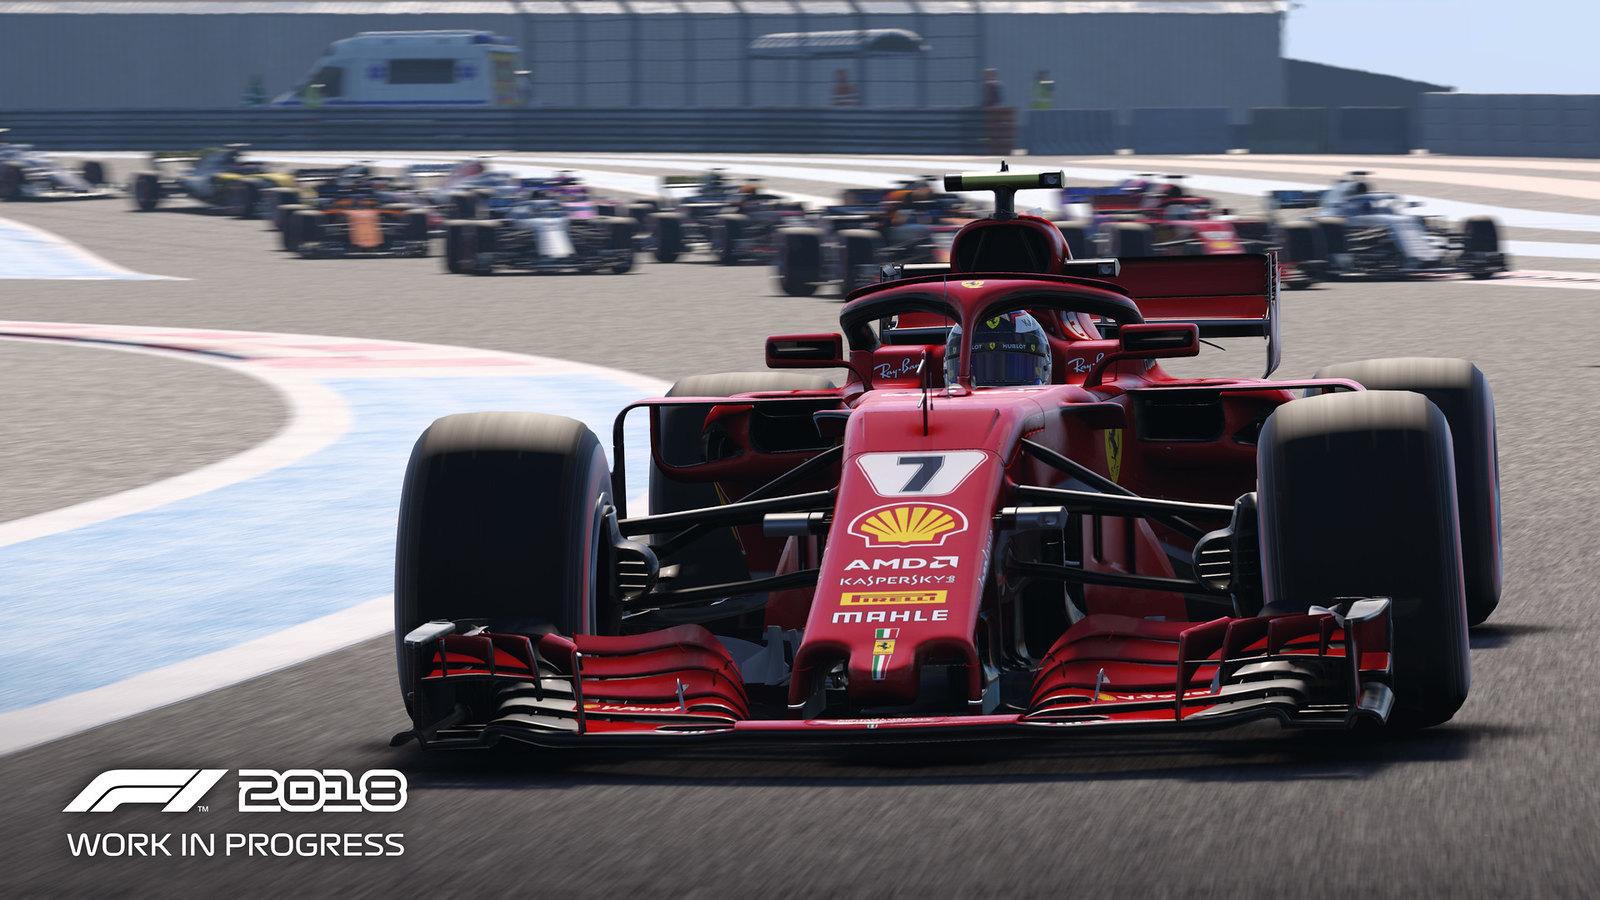 Codemasters F1 2018 Game 4